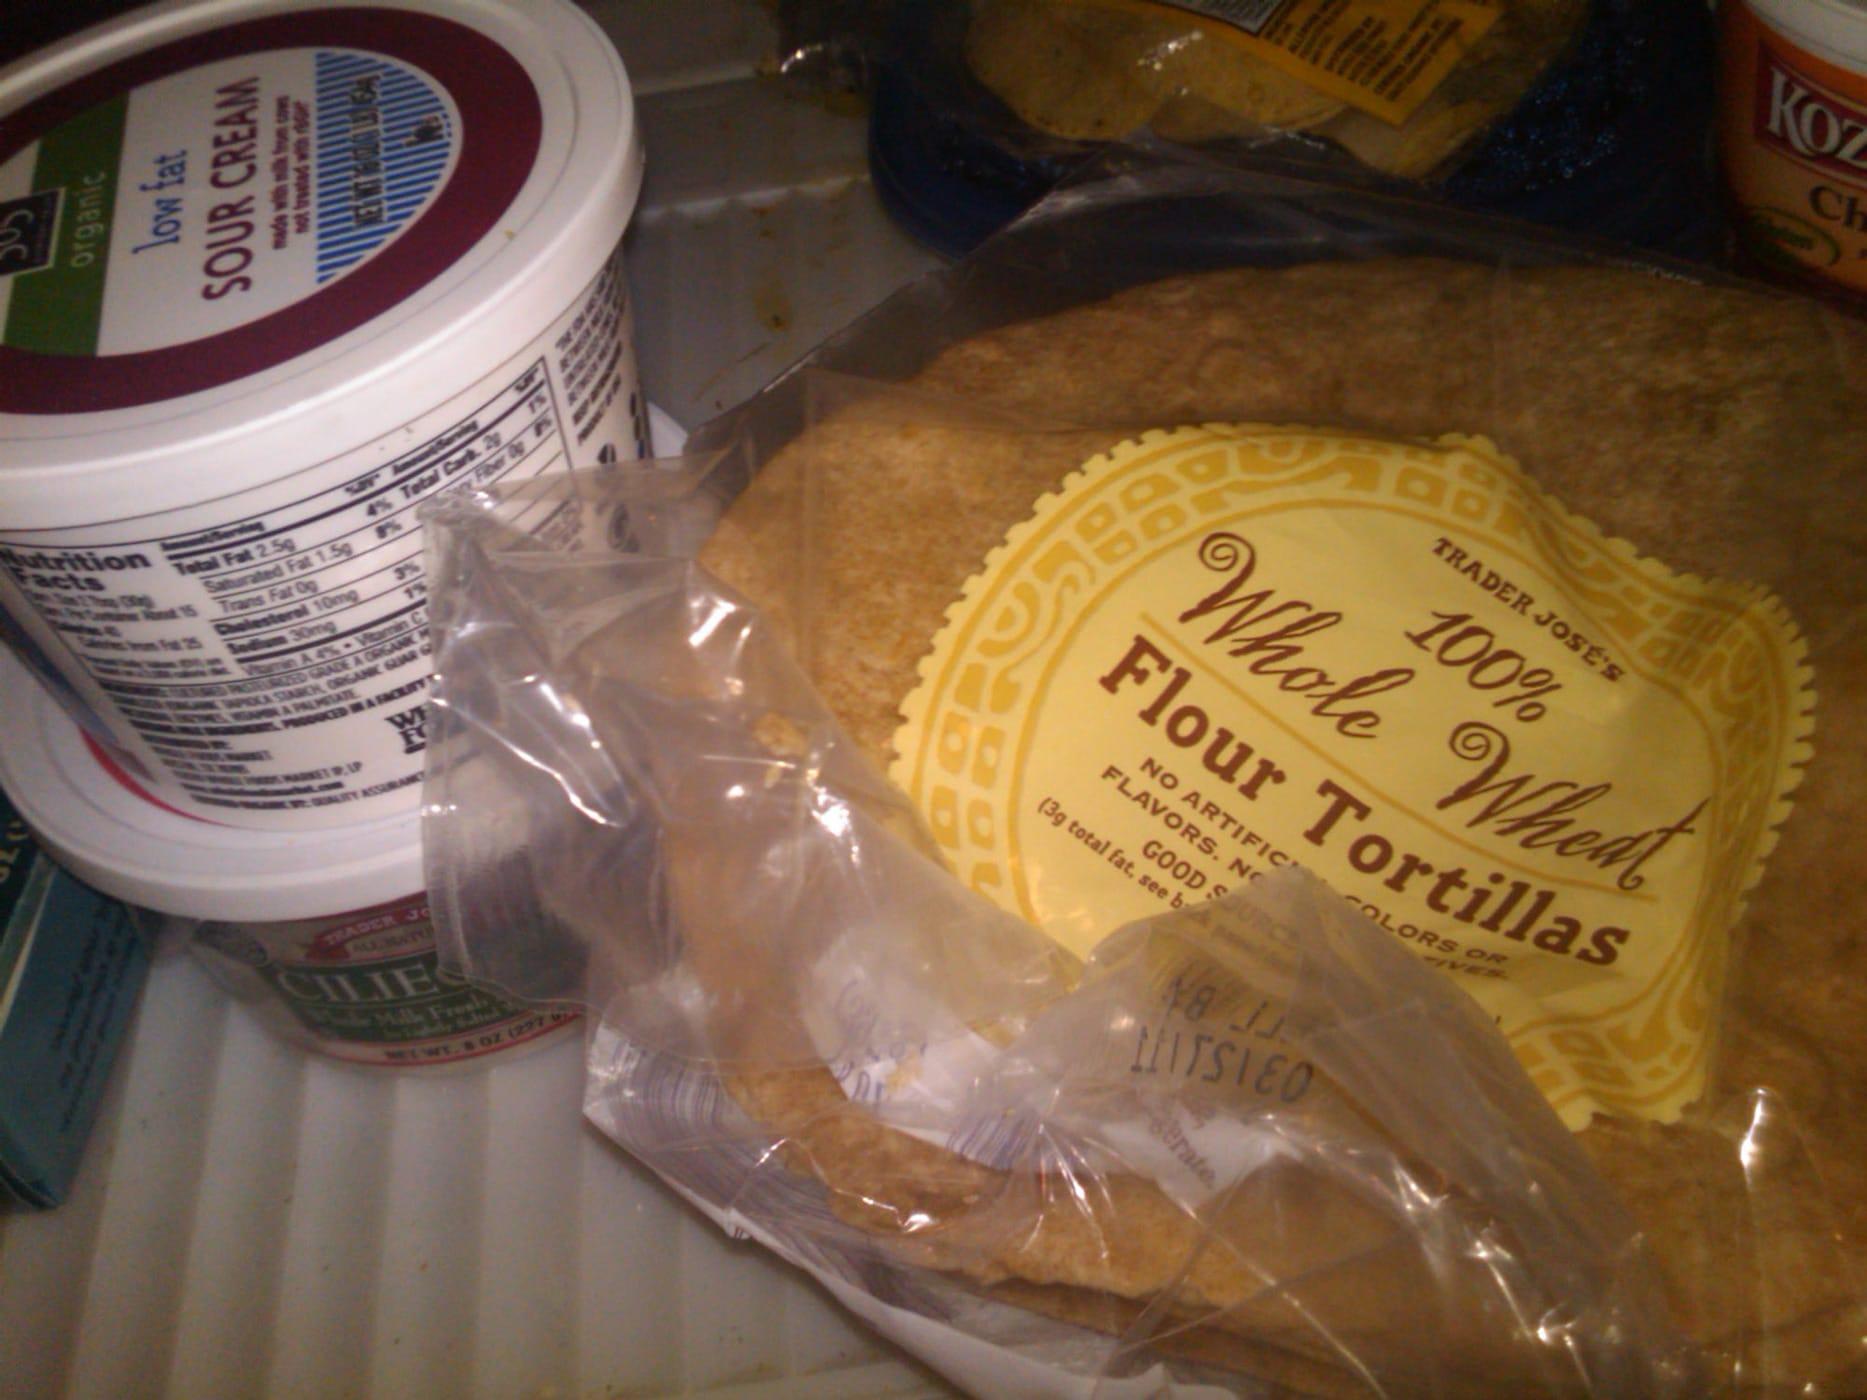 Tortillas and sour cream